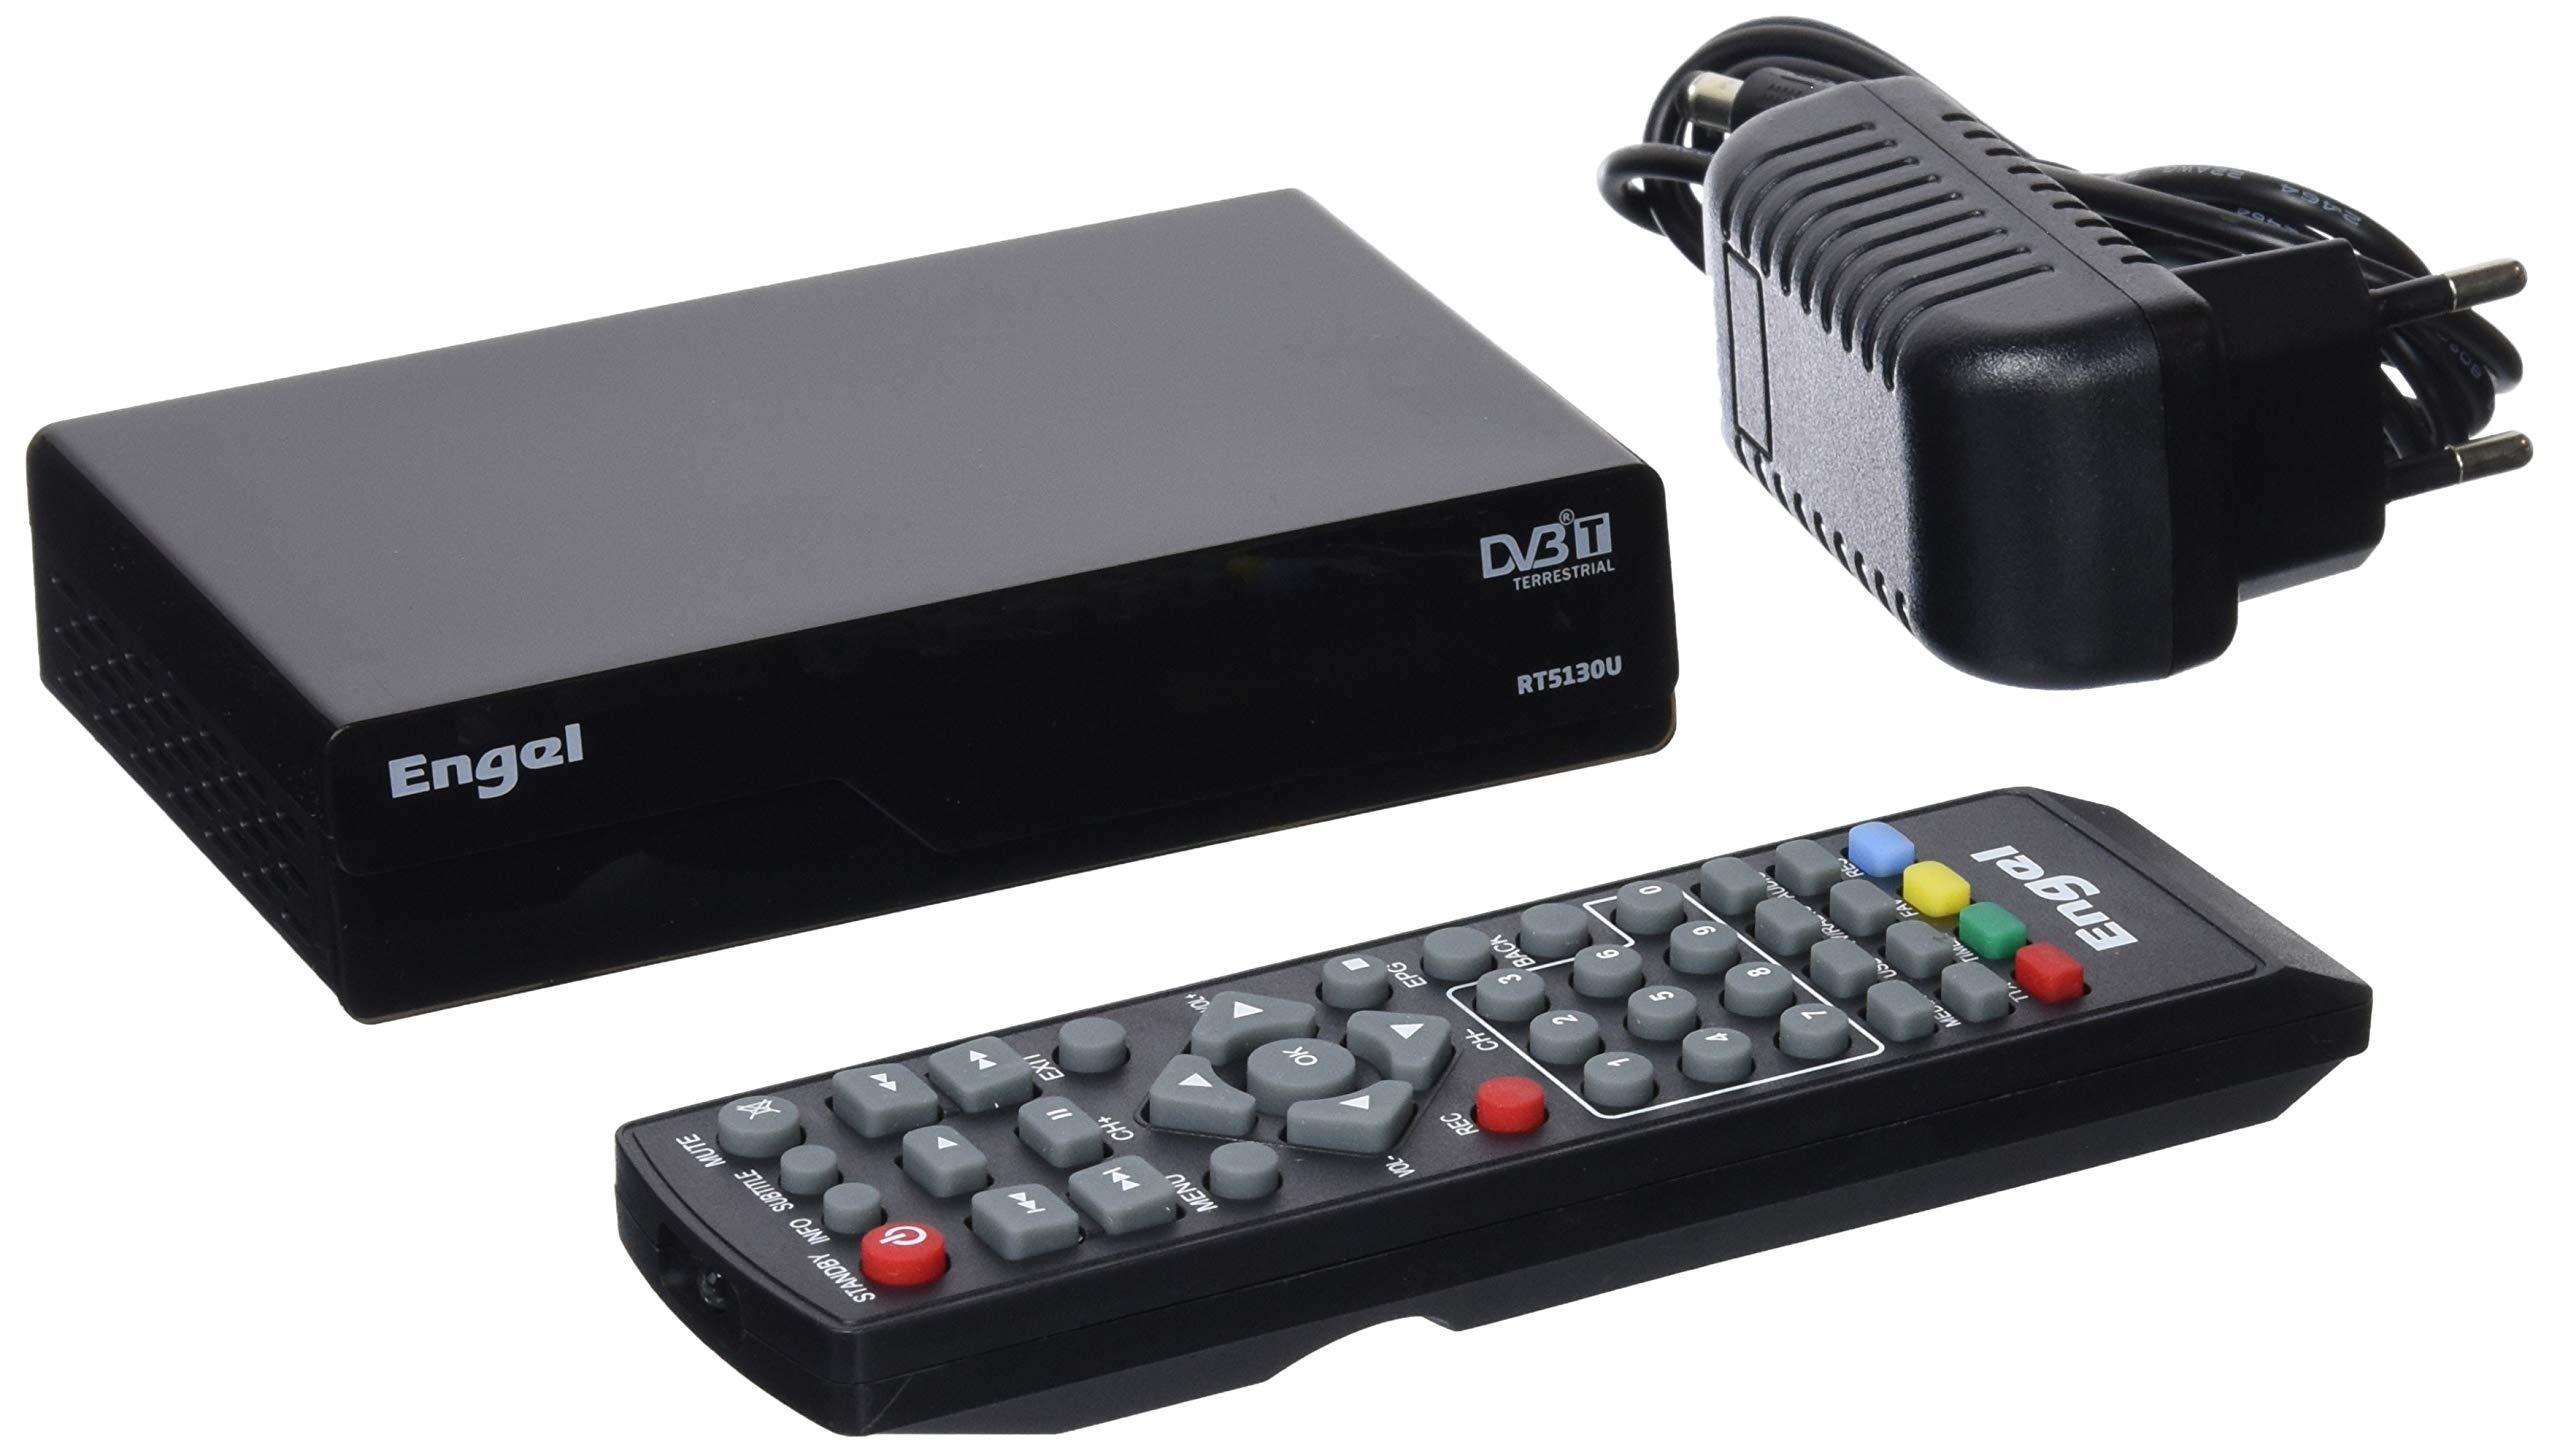 Engel Axil RT5130U - Receptor TDT Televisión Digital Terrestre + USB product image